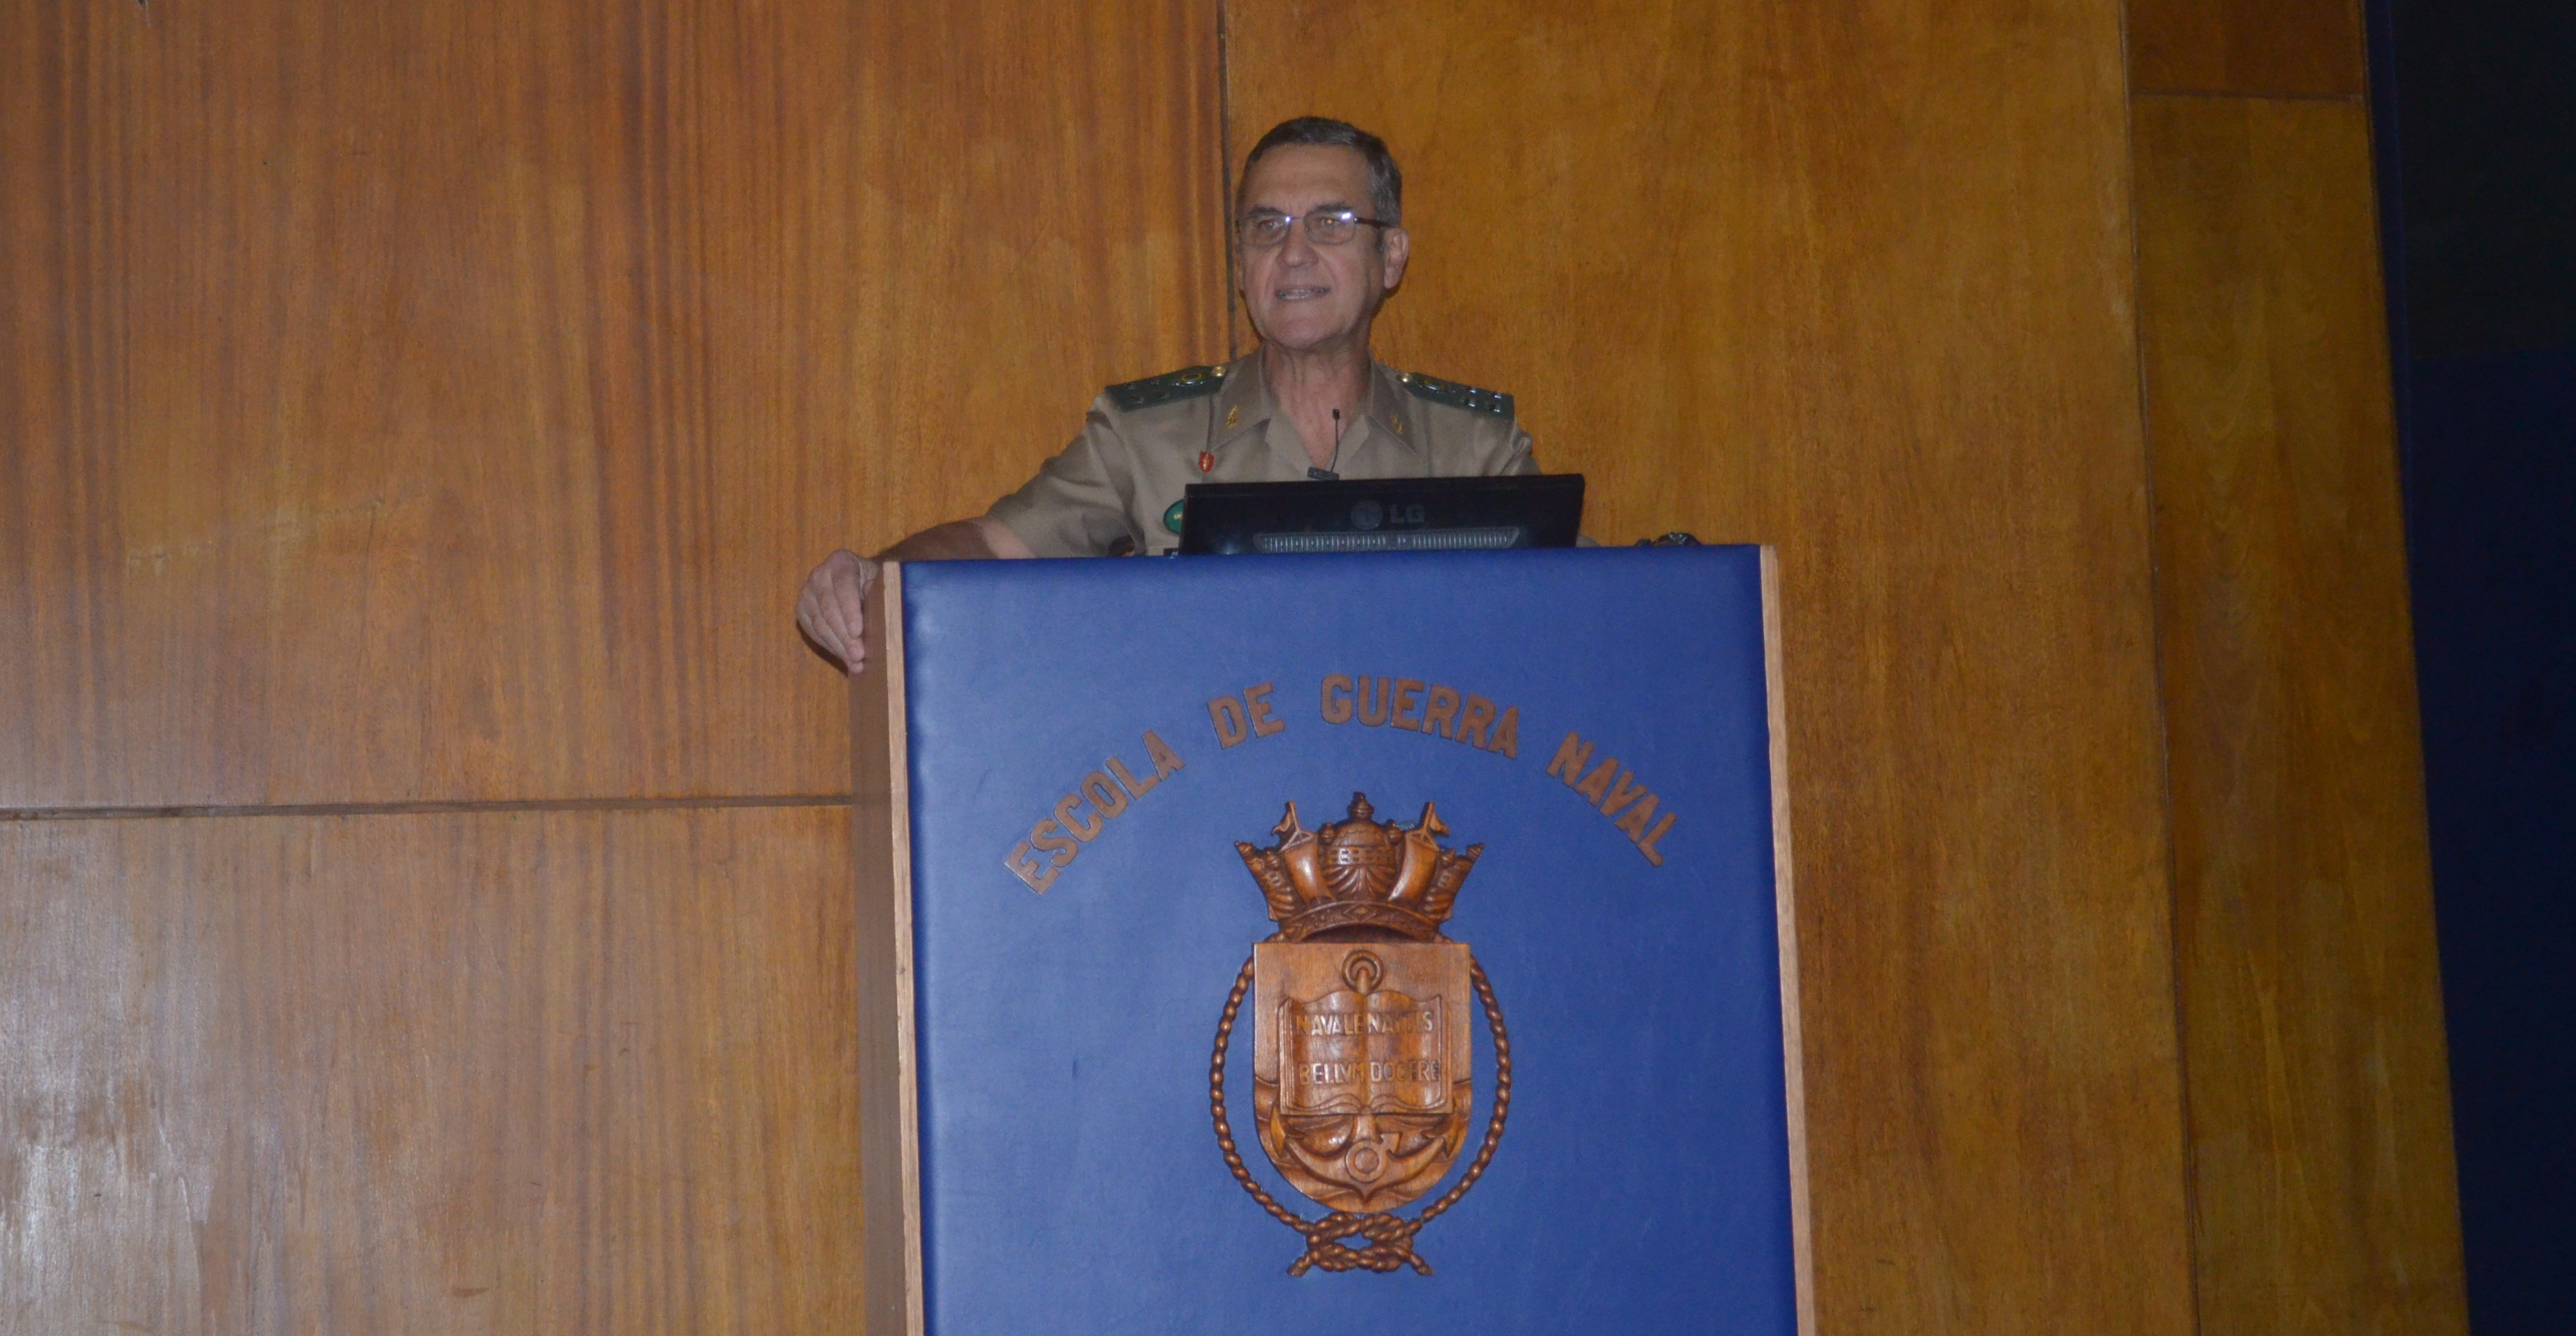 Comandante do Exército Ministra Aula Para o Curso Superior de Defesa